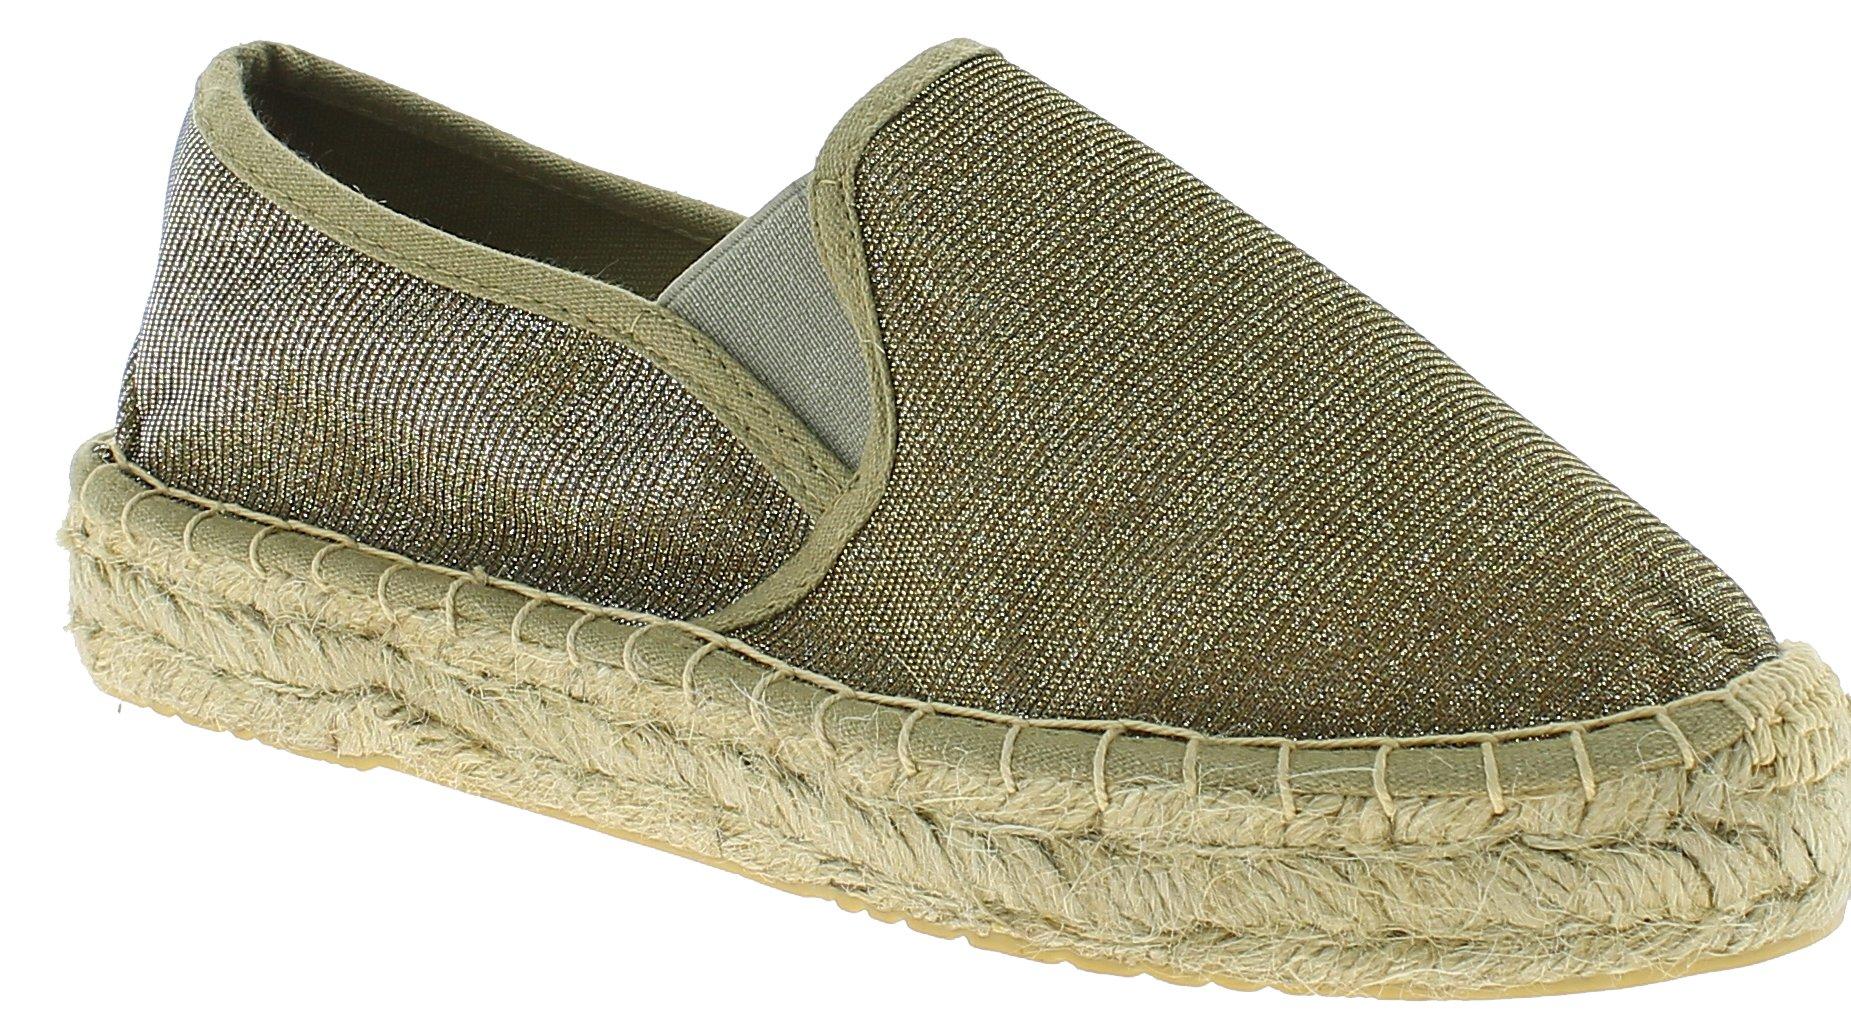 POMPEA Γυναικείο Casual LITA 213 Χρυσό - IqShoes - LITA 213 GOLD-gold-37/1/34/27 παπούτσια  προσφορεσ